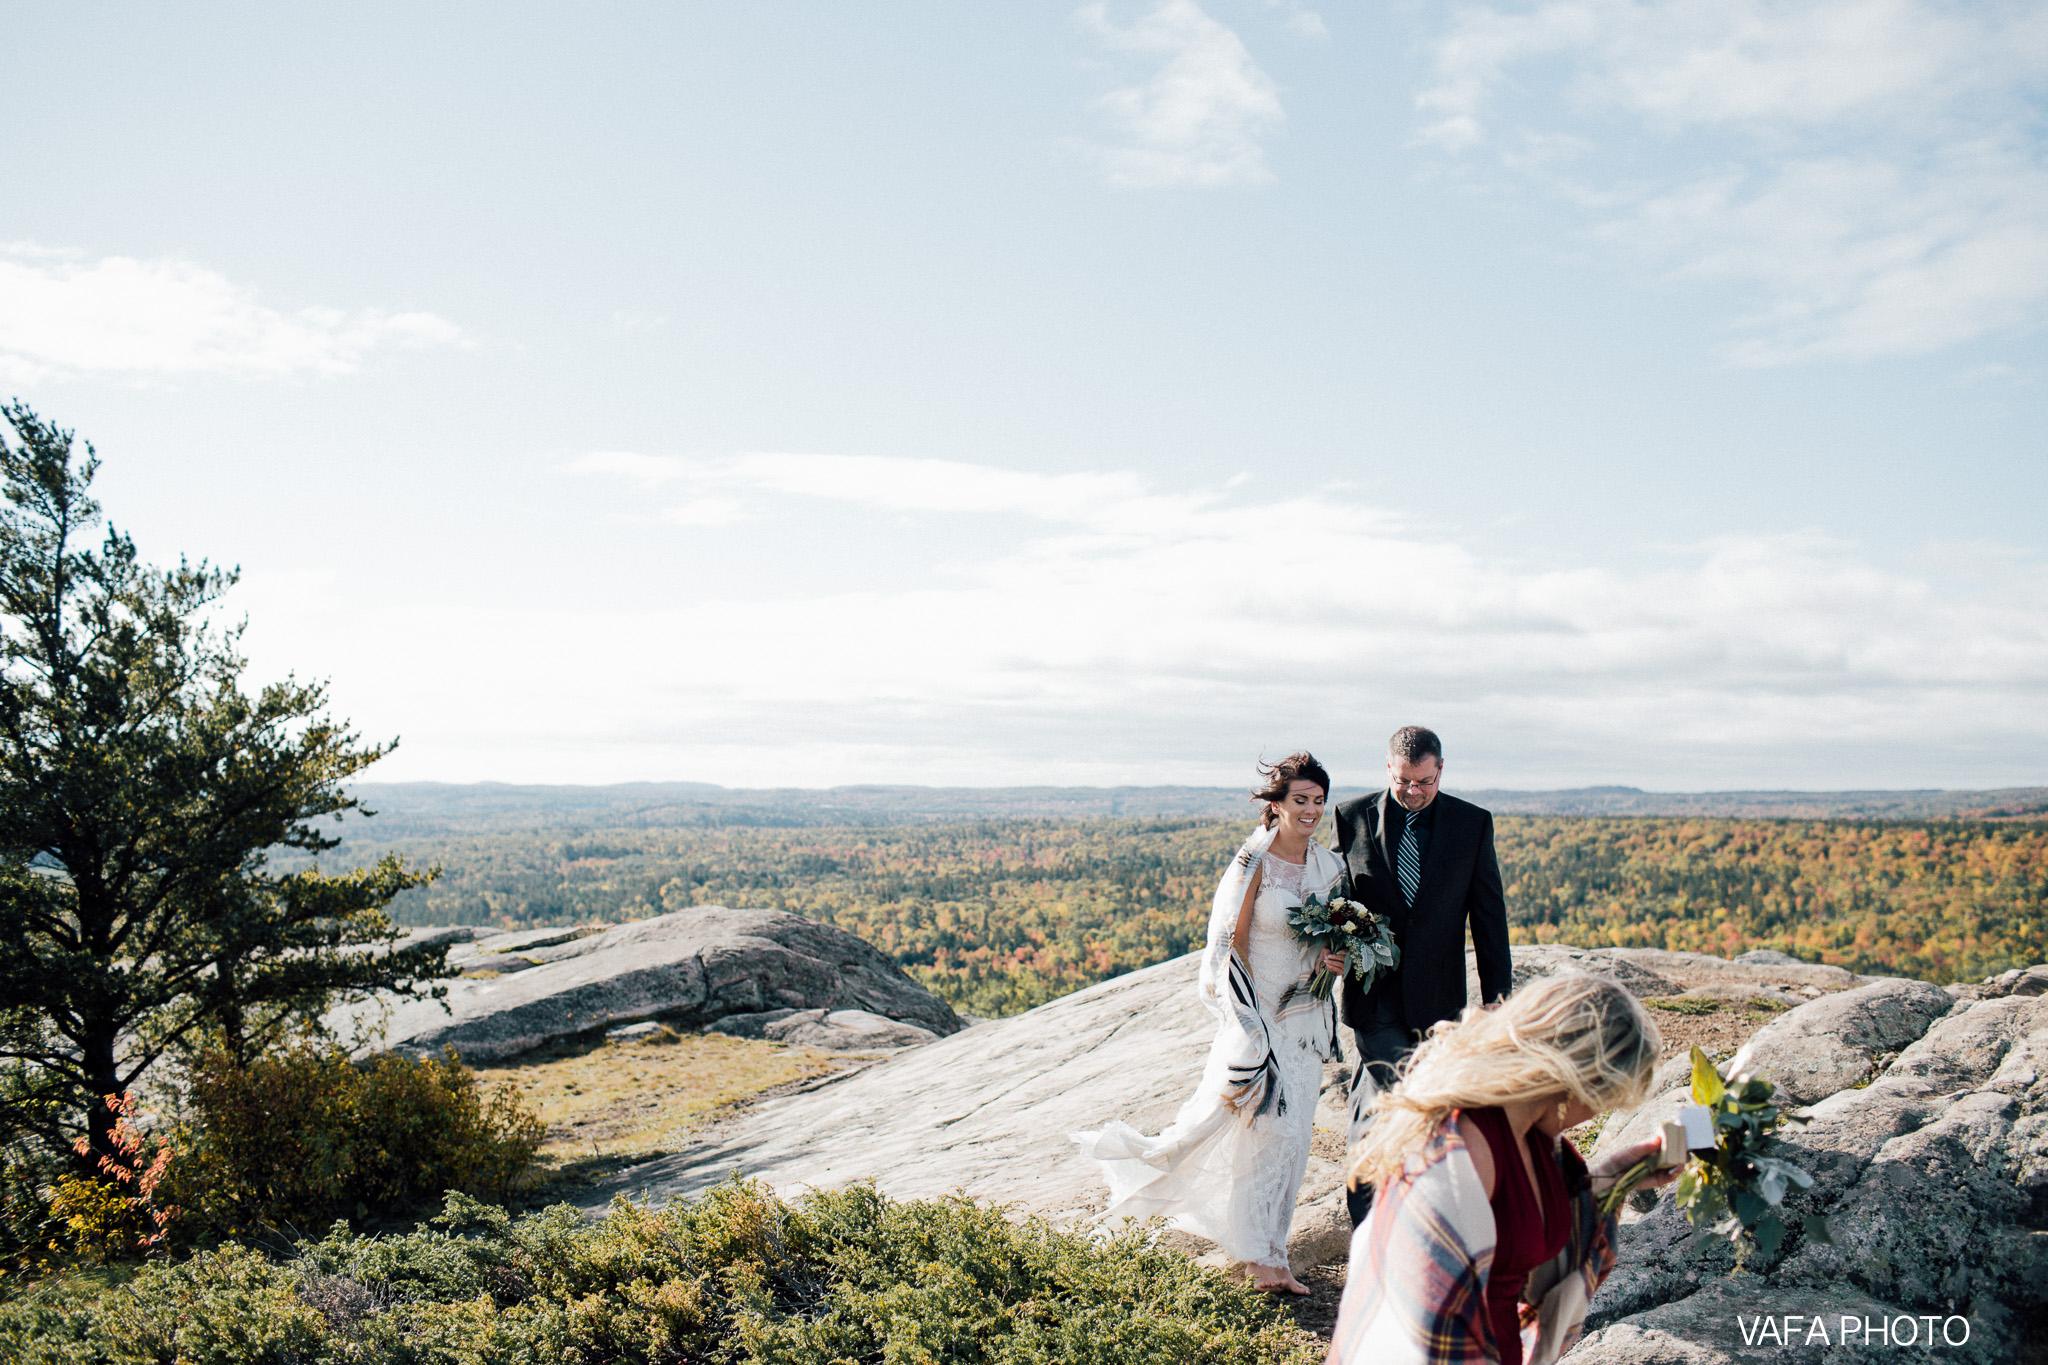 Hogback-Mountain-Wedding-Chelsea-Josh-Vafa-Photo-173.jpg